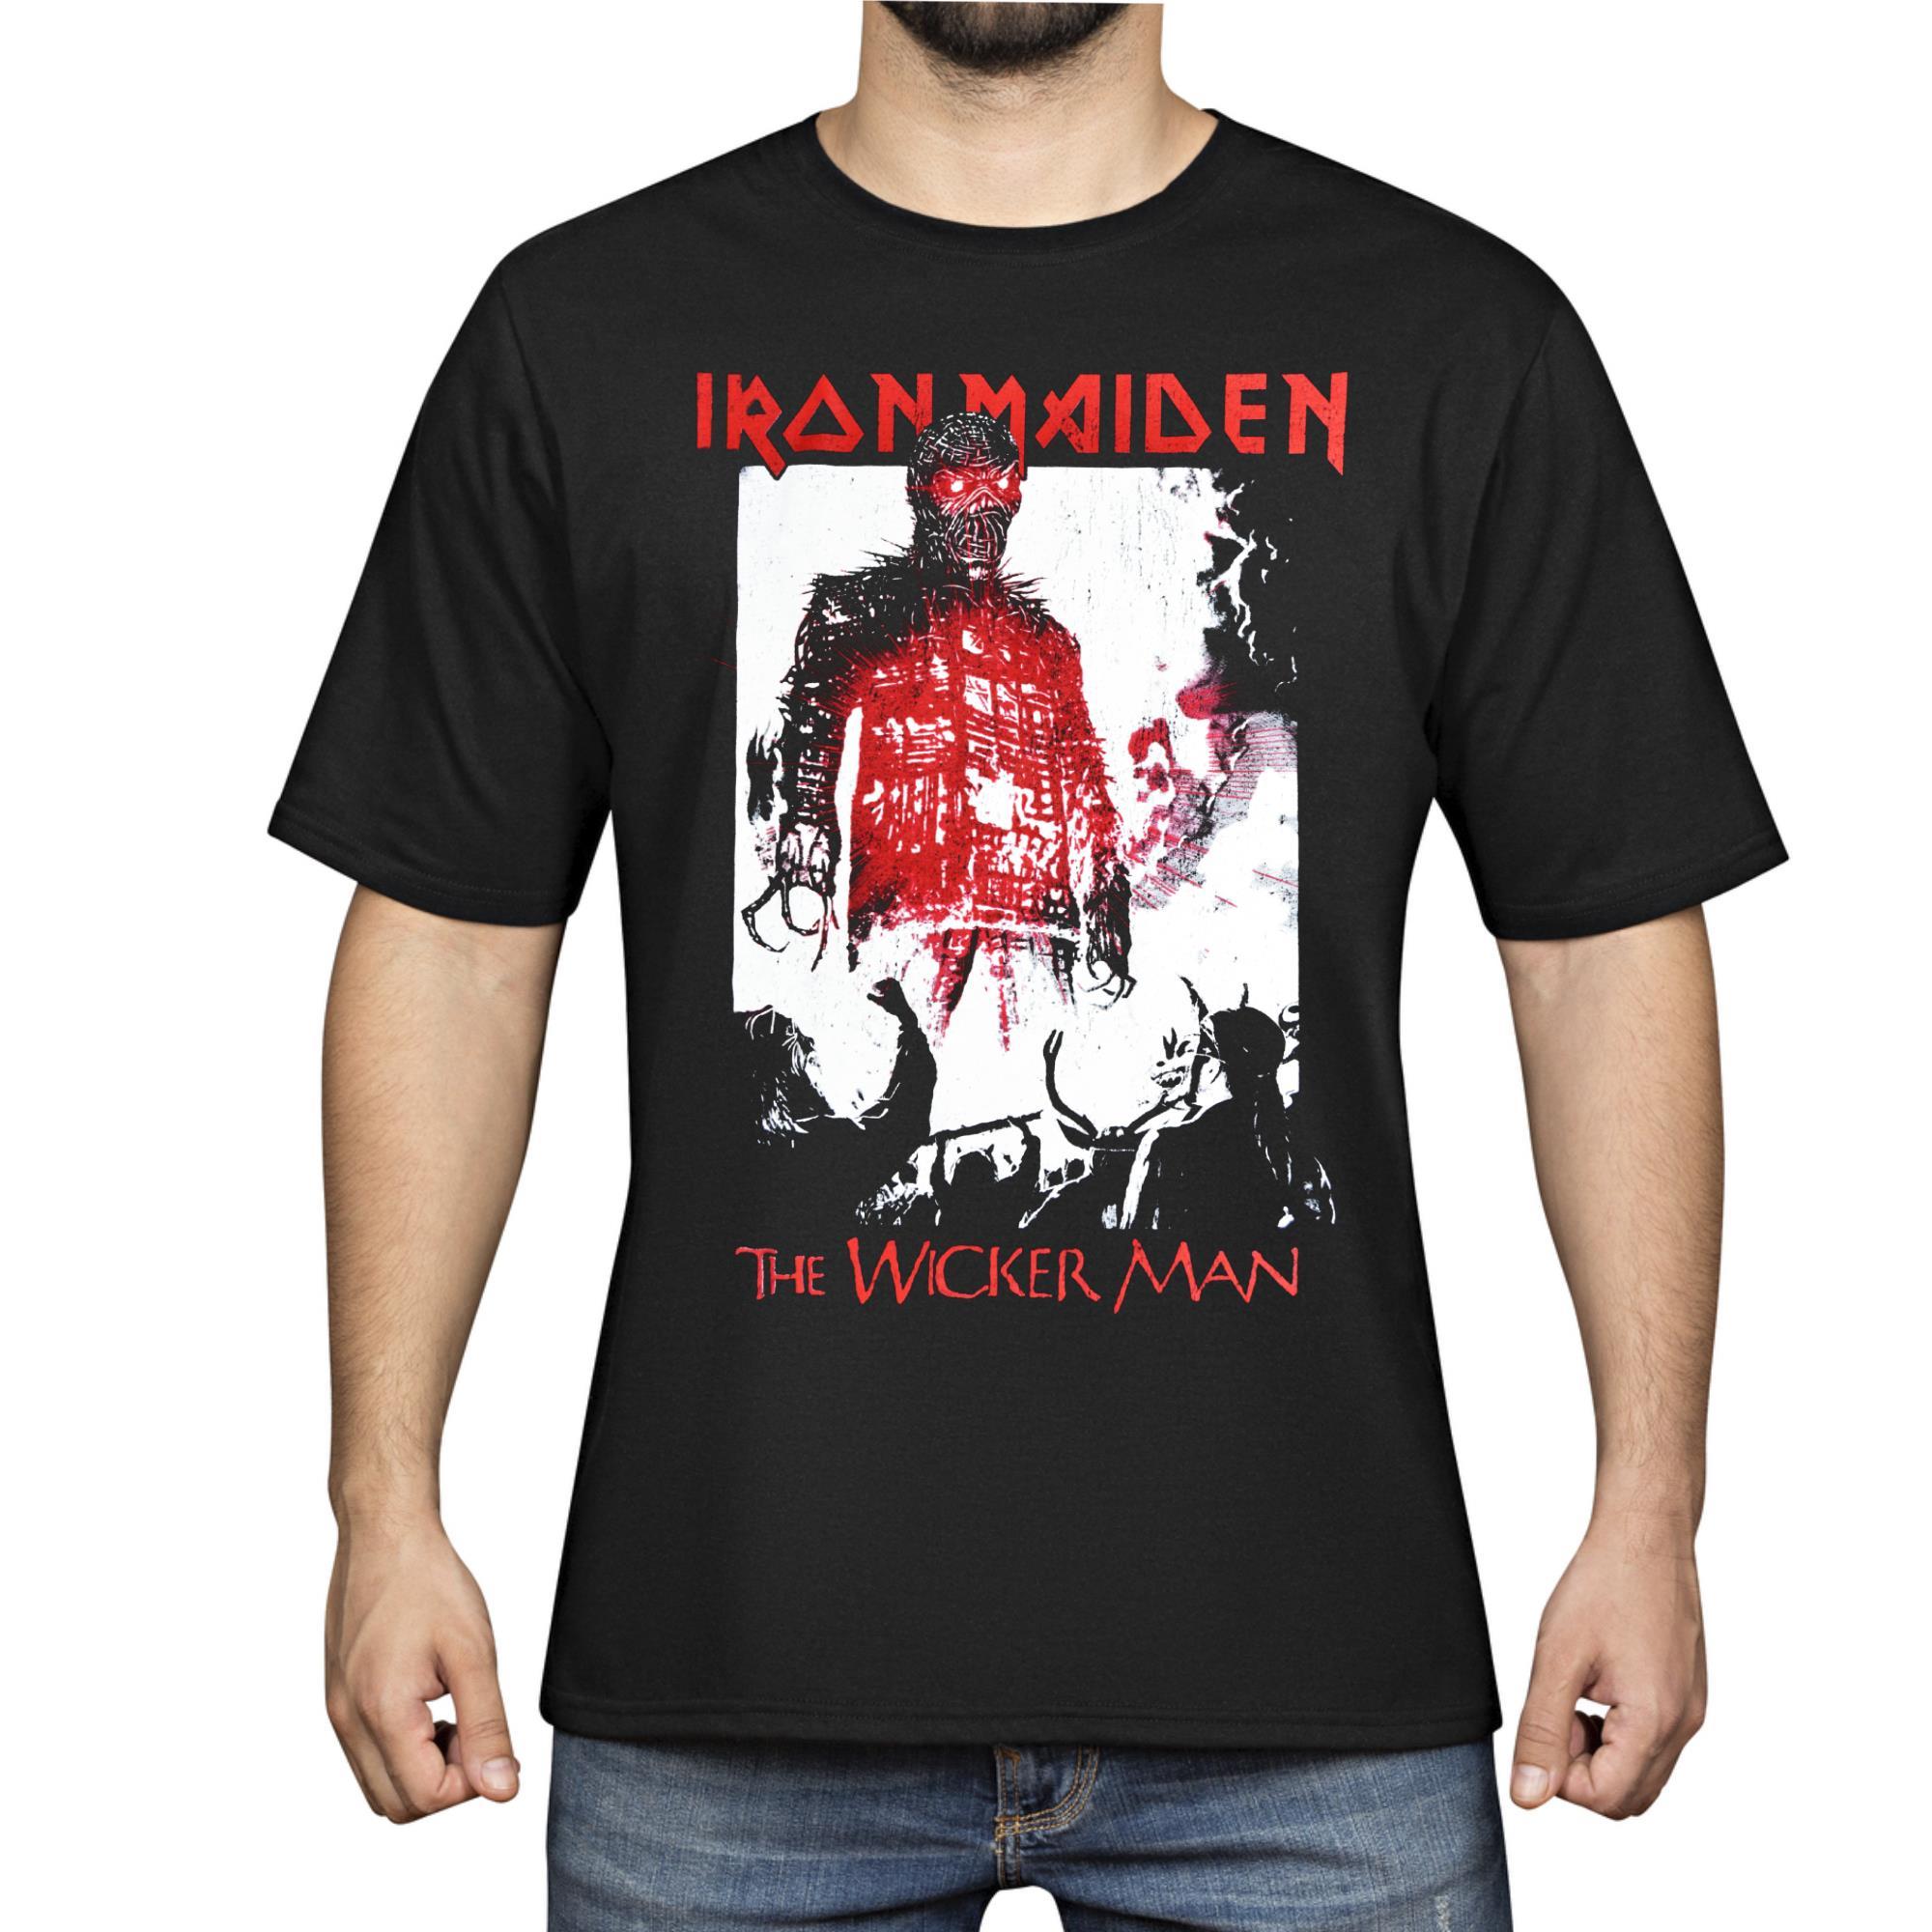 Wicker Man (Import) T-shirt